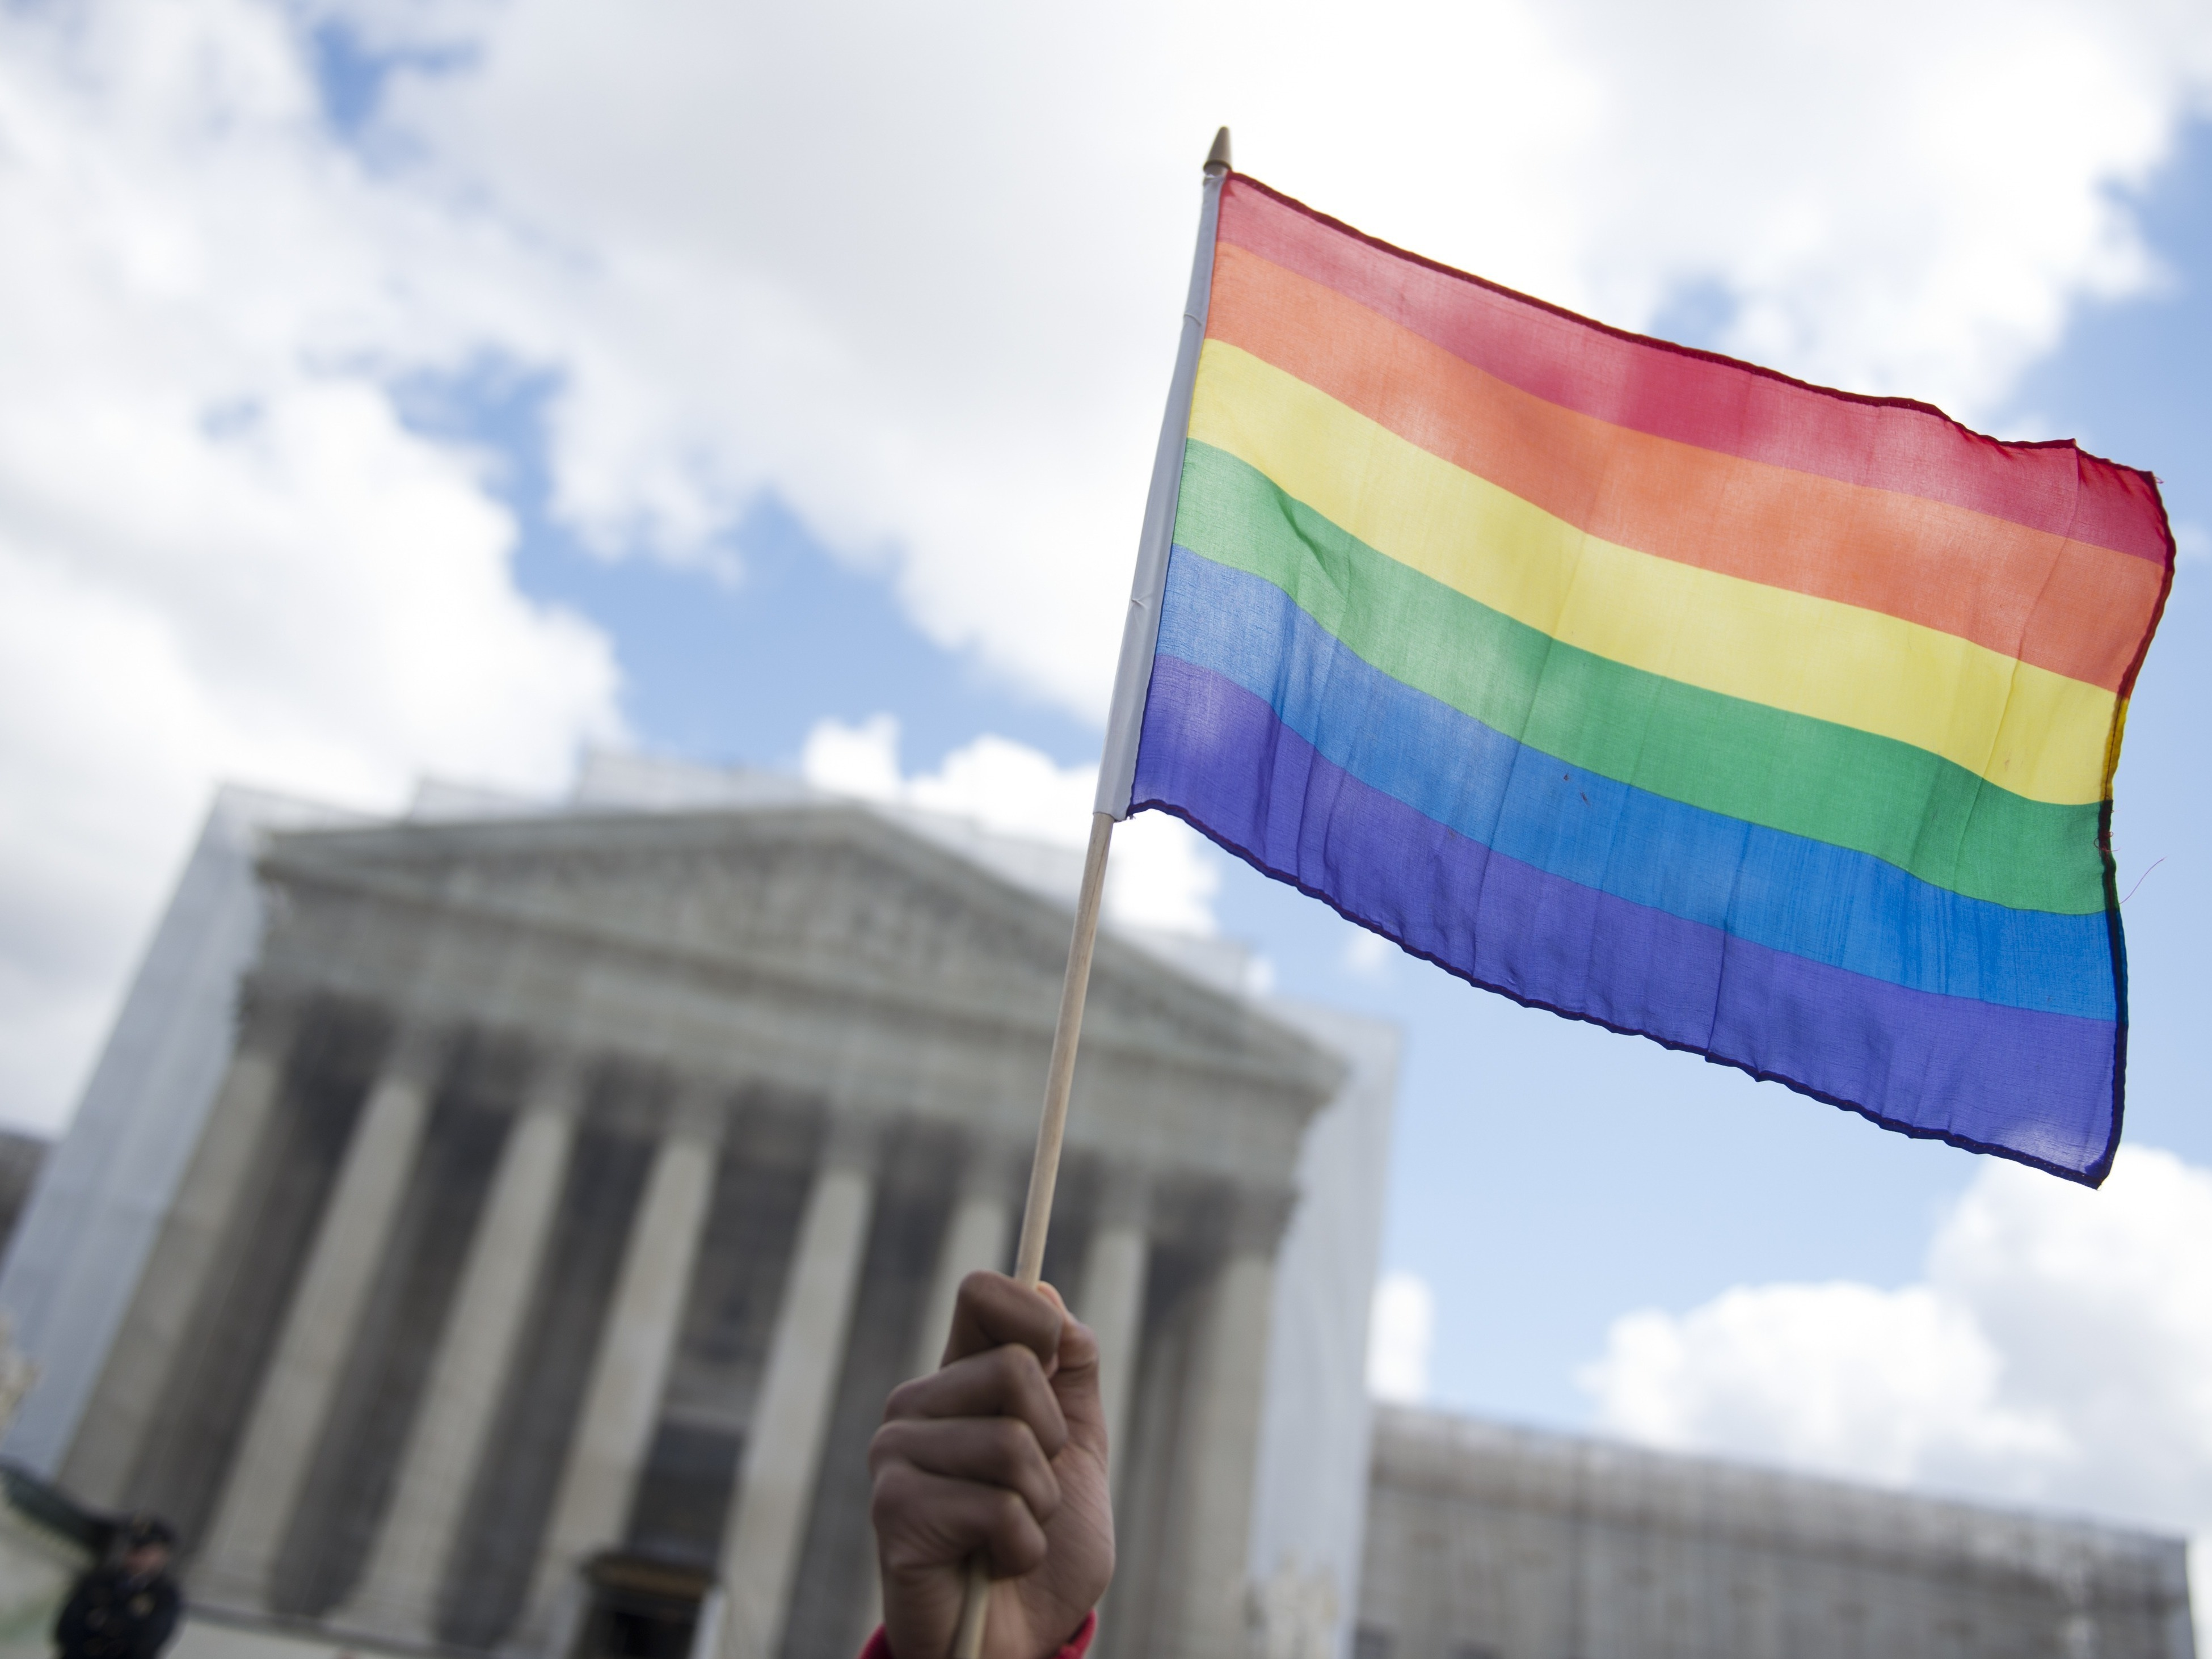 Supreme court ruling makes same